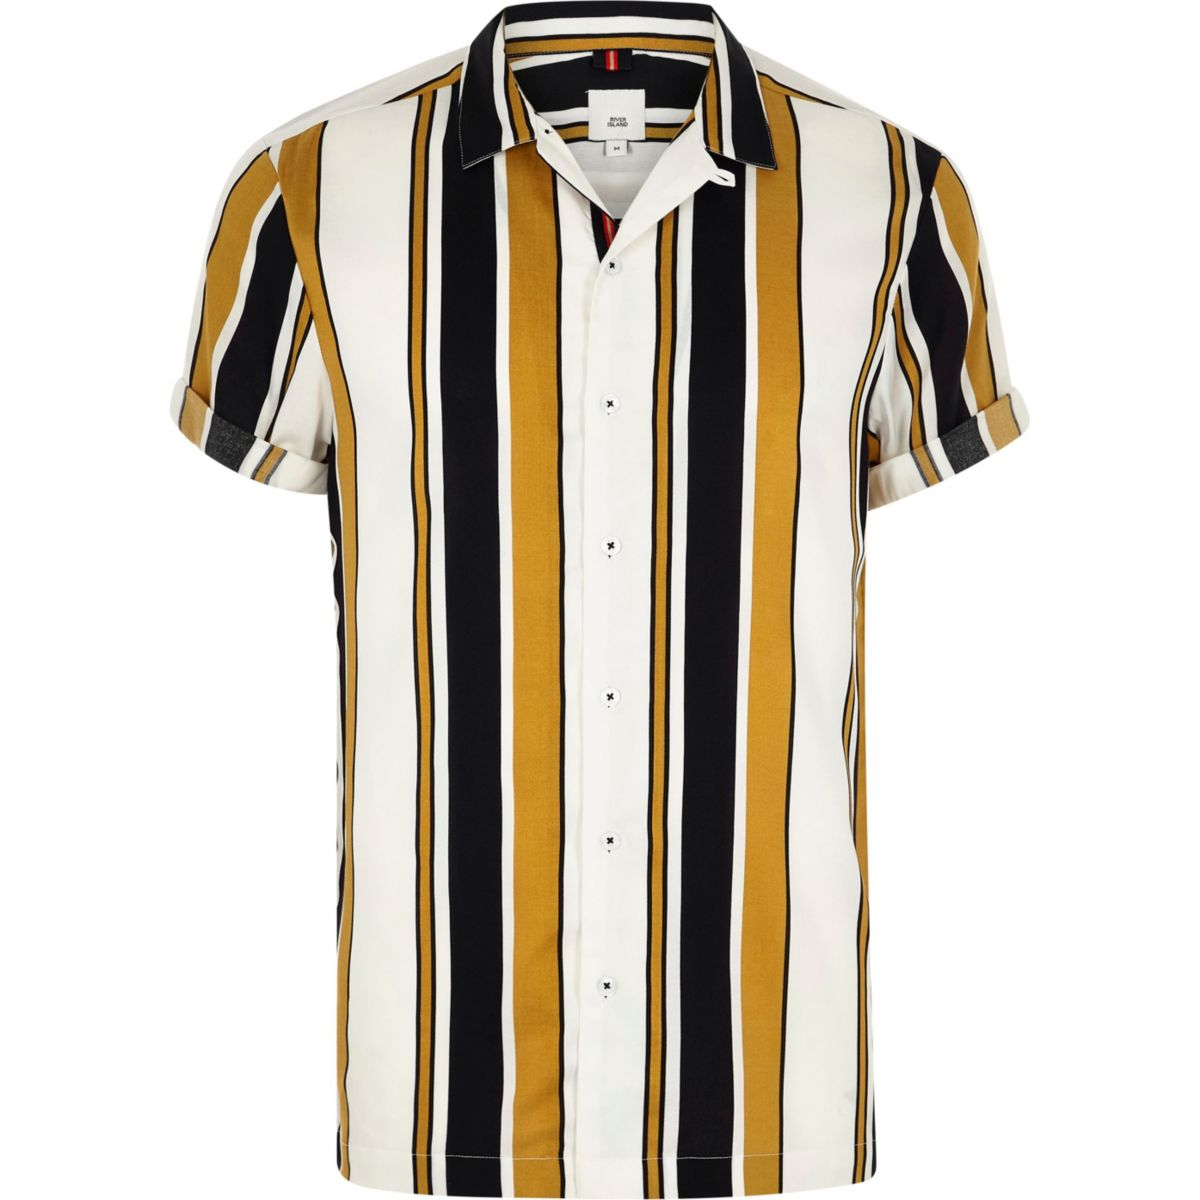 Chemise Big and Tall jaune rayée avec revers